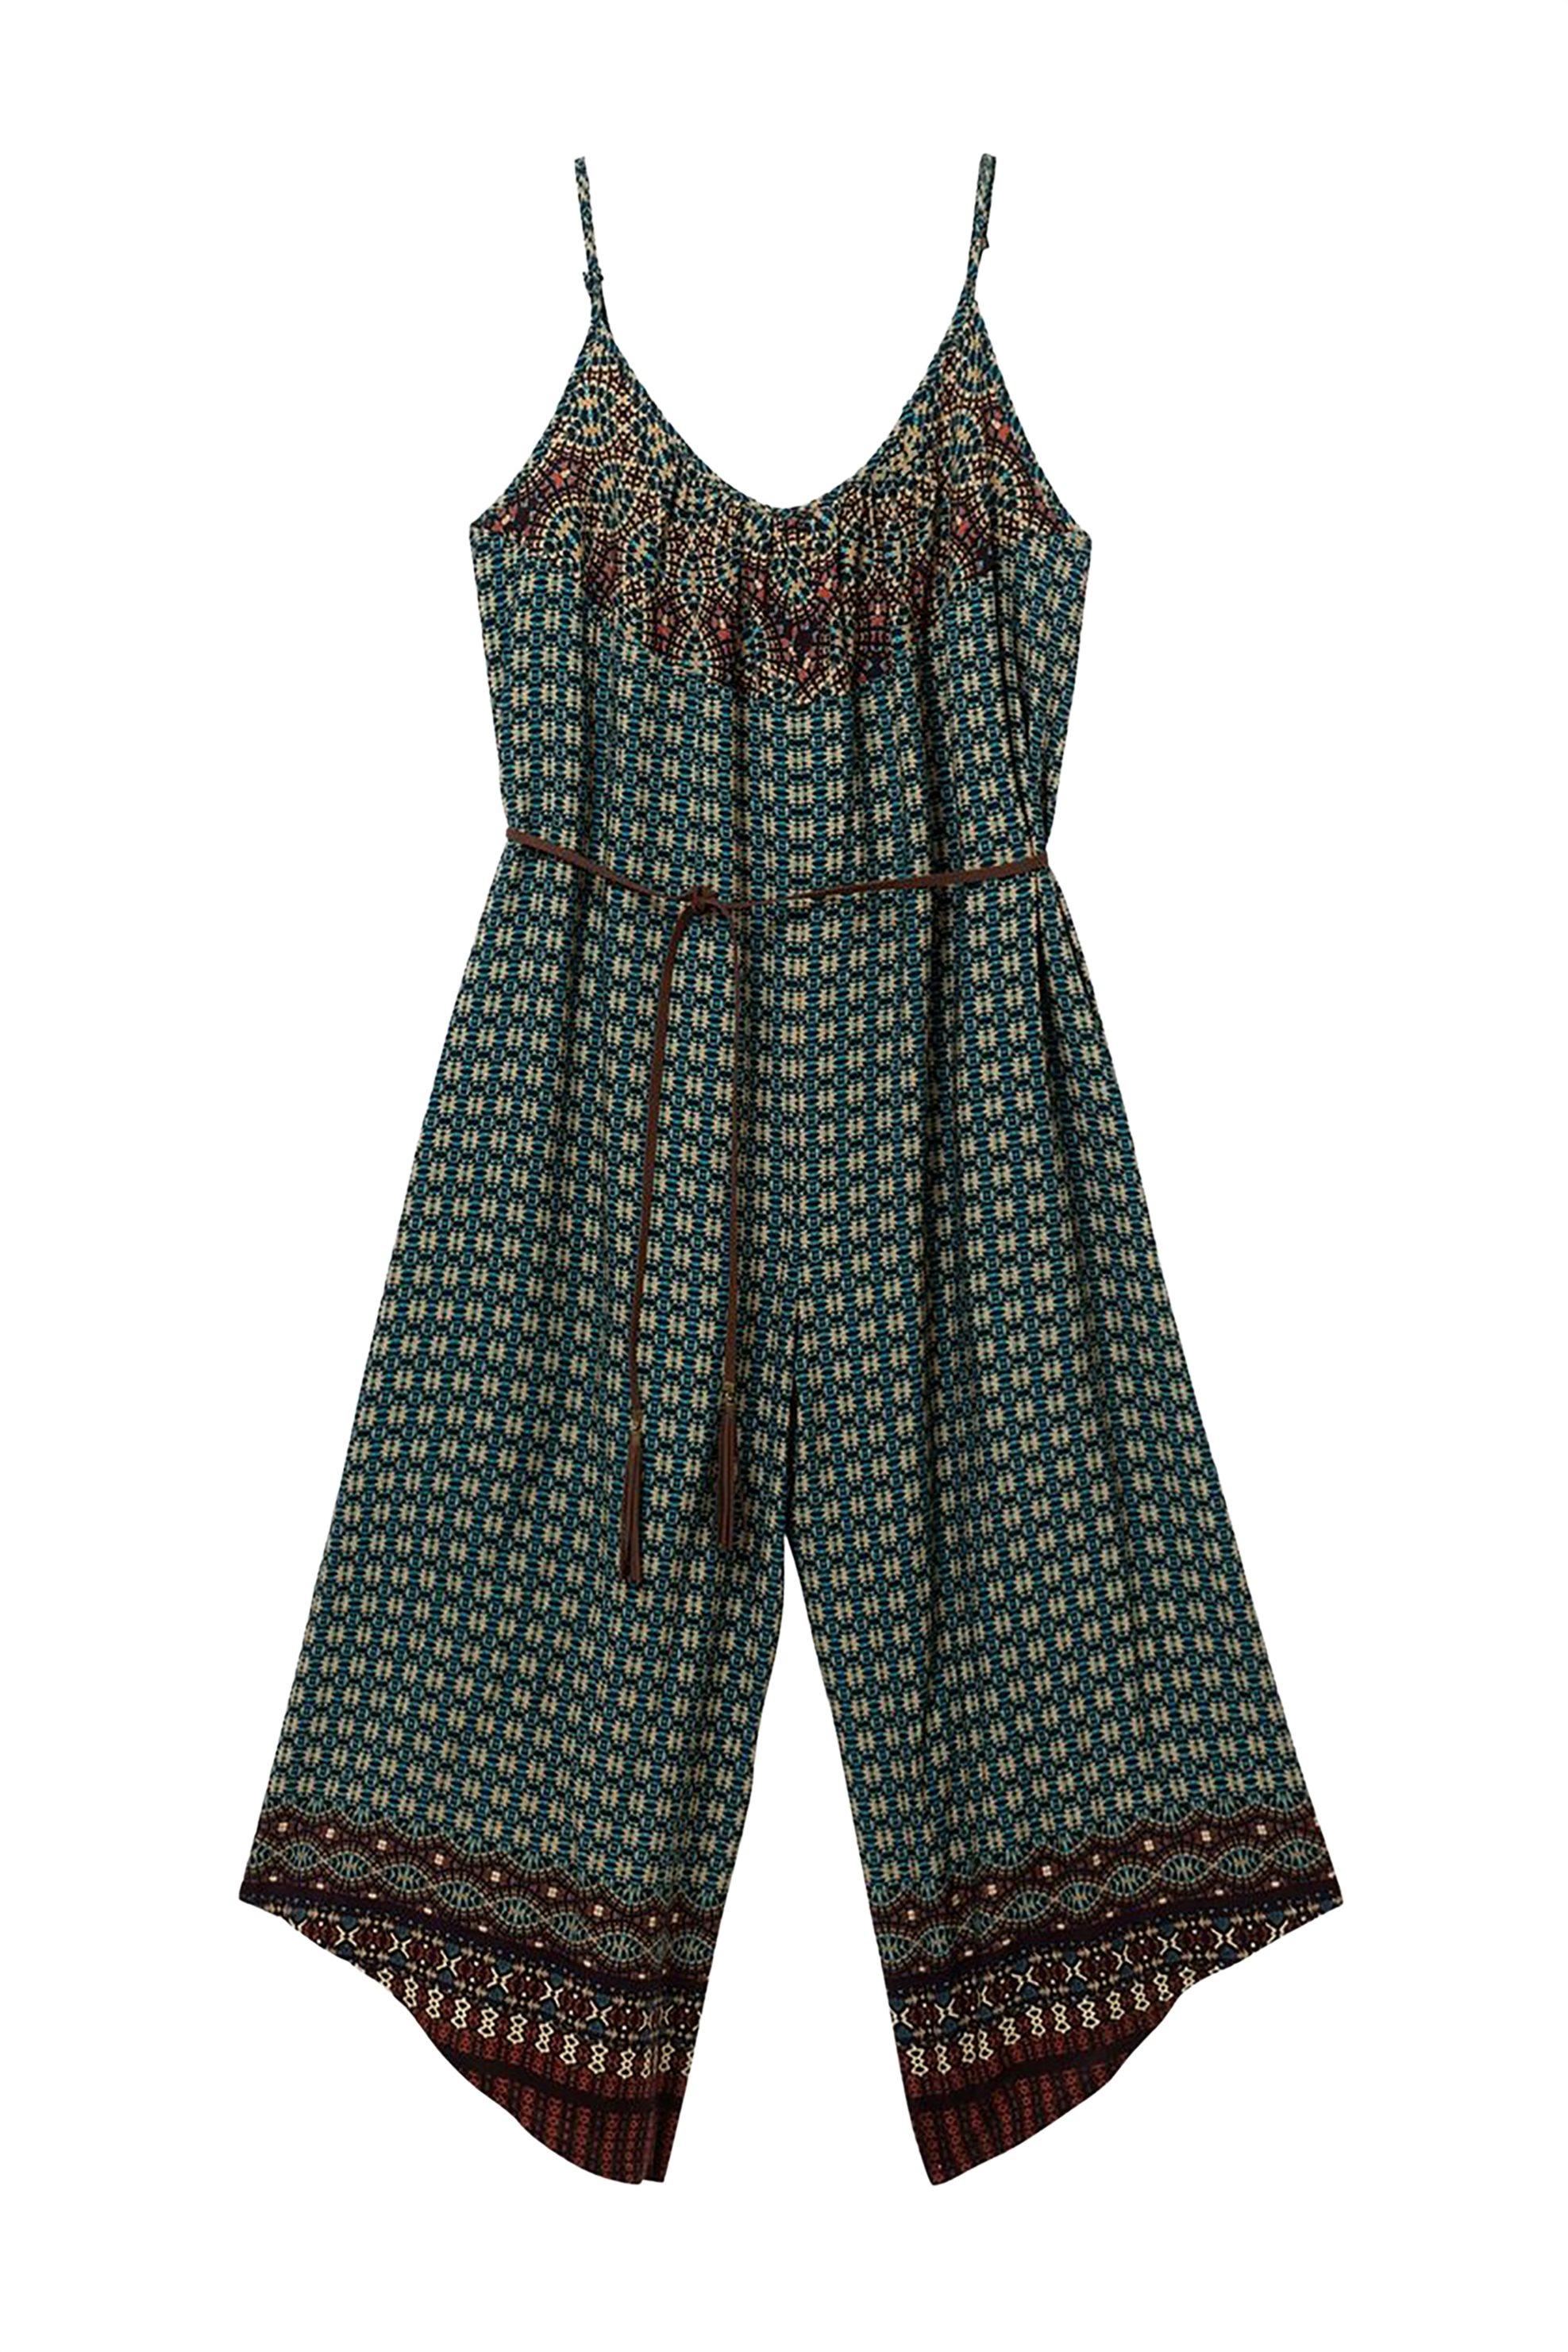 Desigual γυναικεία ολόσωμη φόρμα εμπριμέ με ζωνάκι Rasha - 19SWPW17 - Πράσινο γυναικα   ρουχα   ολόσωμες φόρμες   σαλοπέτες